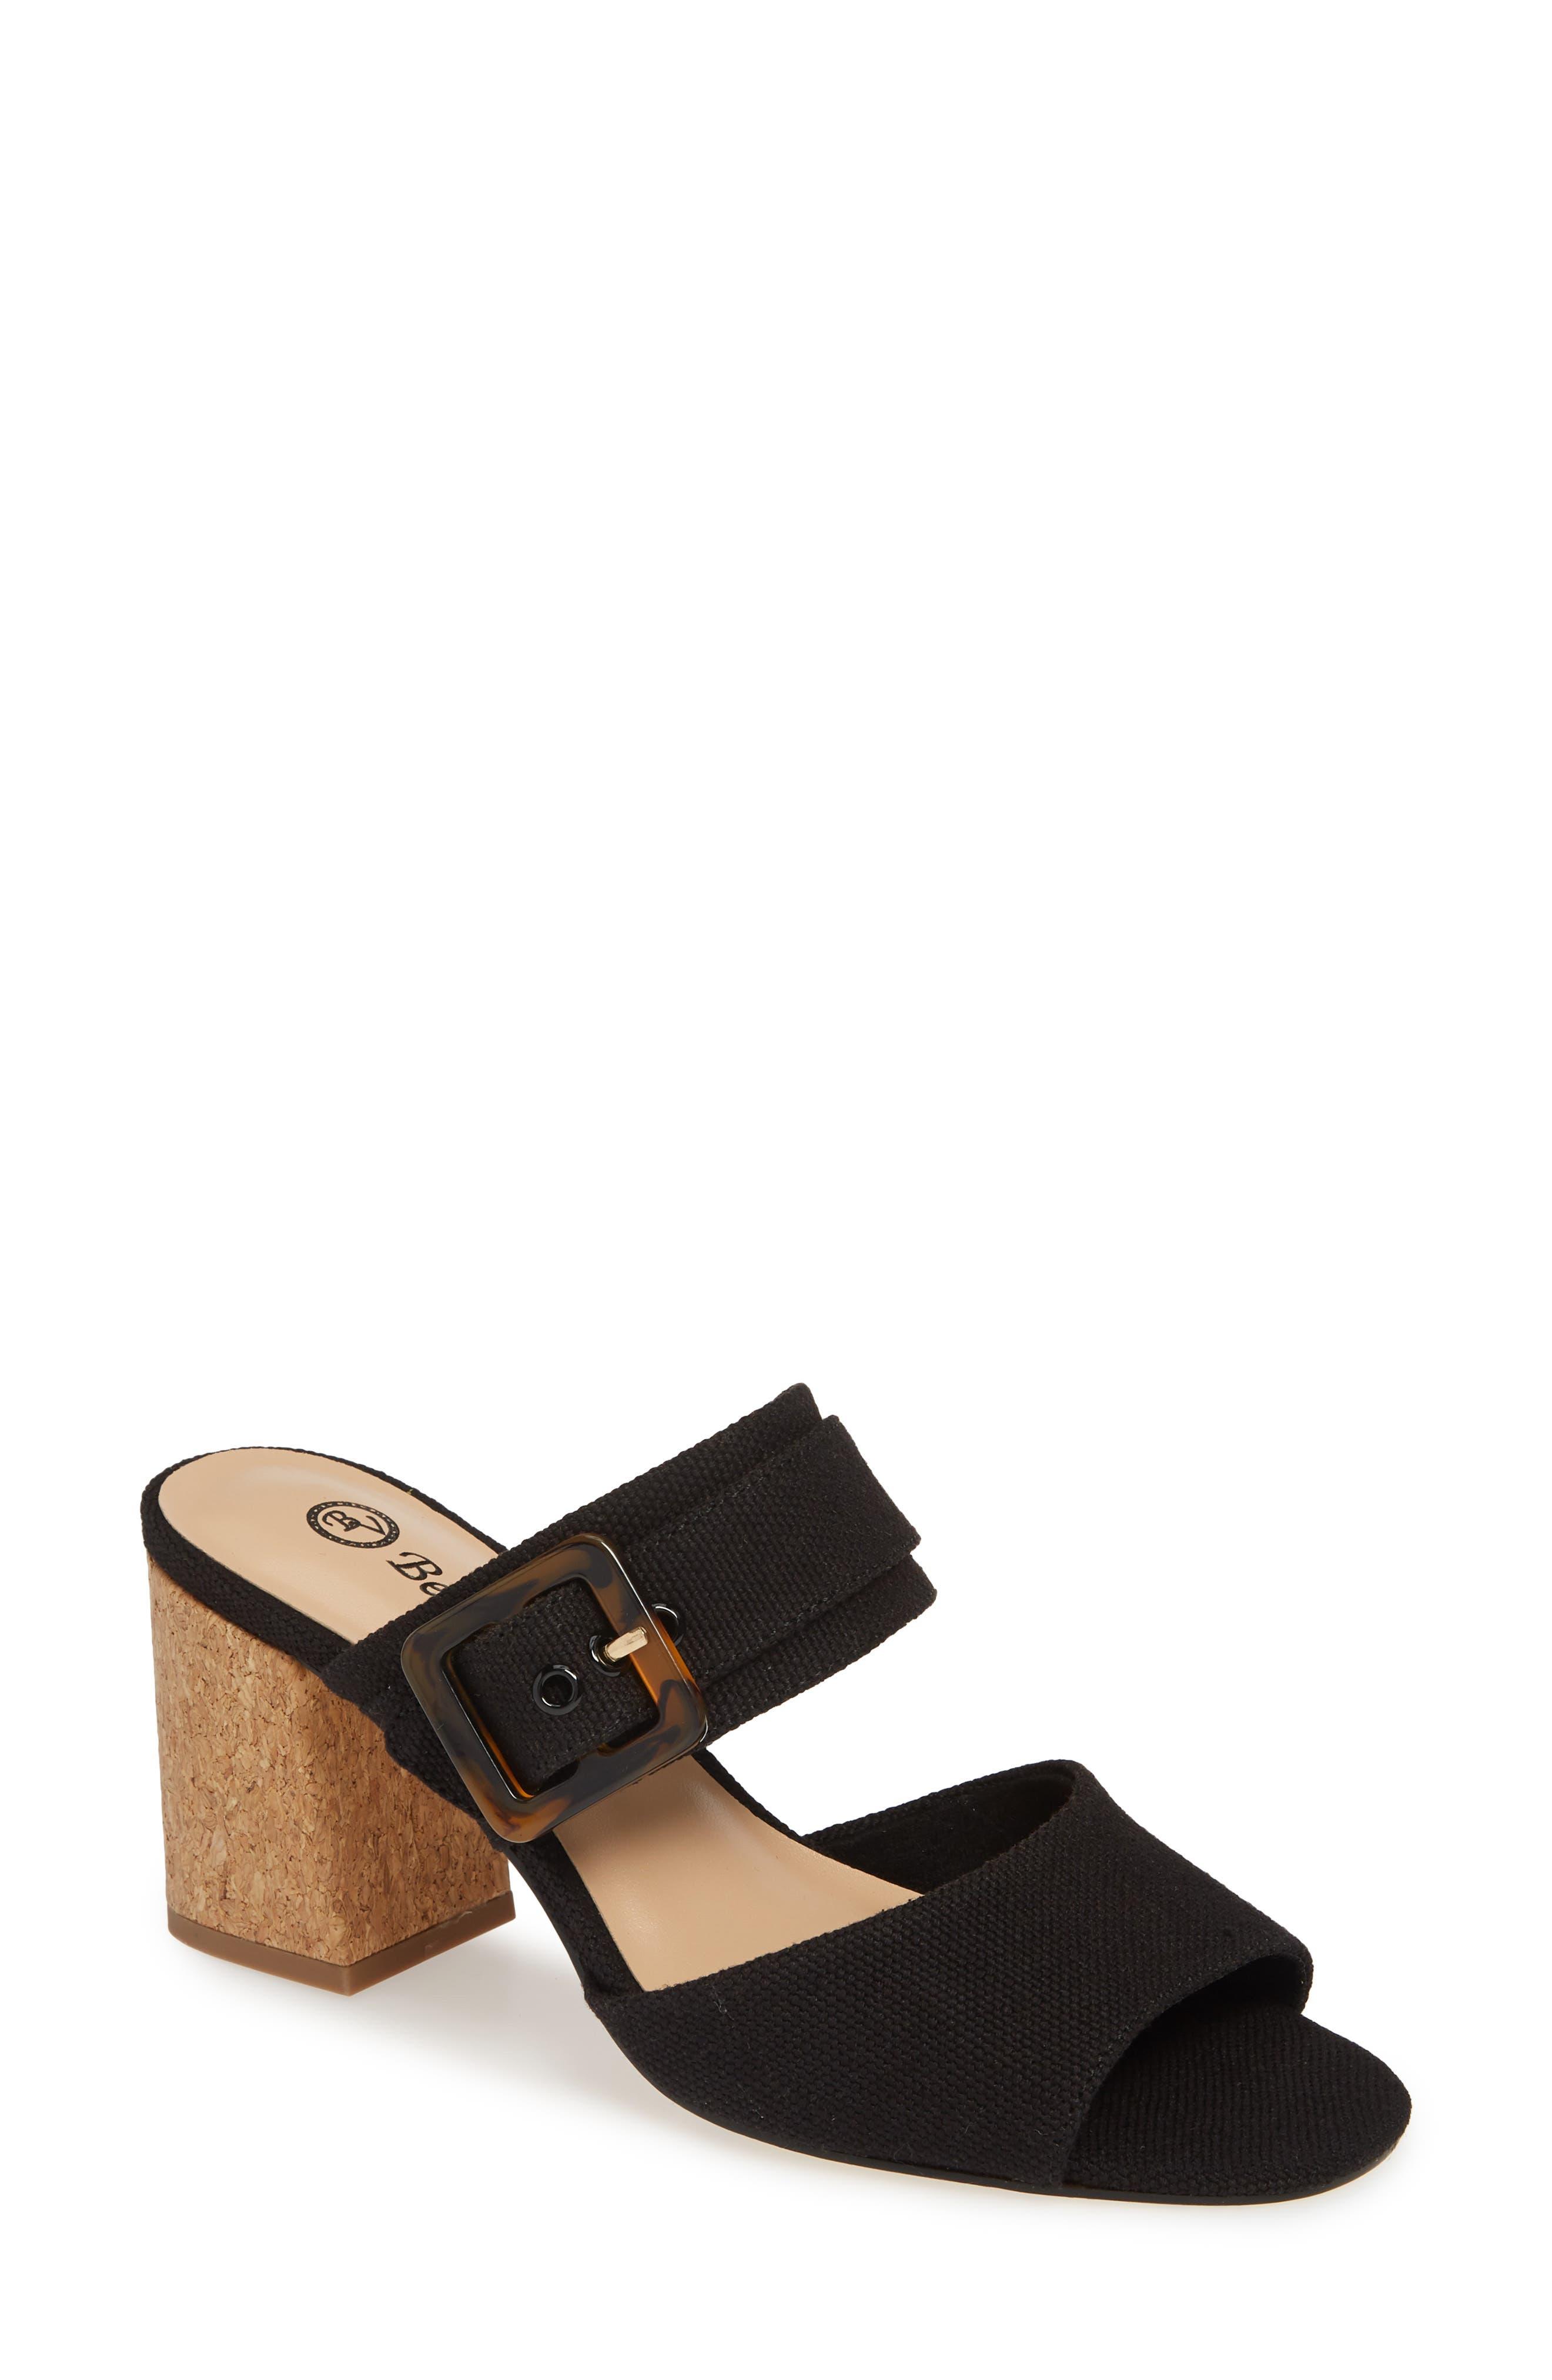 Tory II Buckle Slide Sandal, Main, color, BLACK LINEN FABRIC